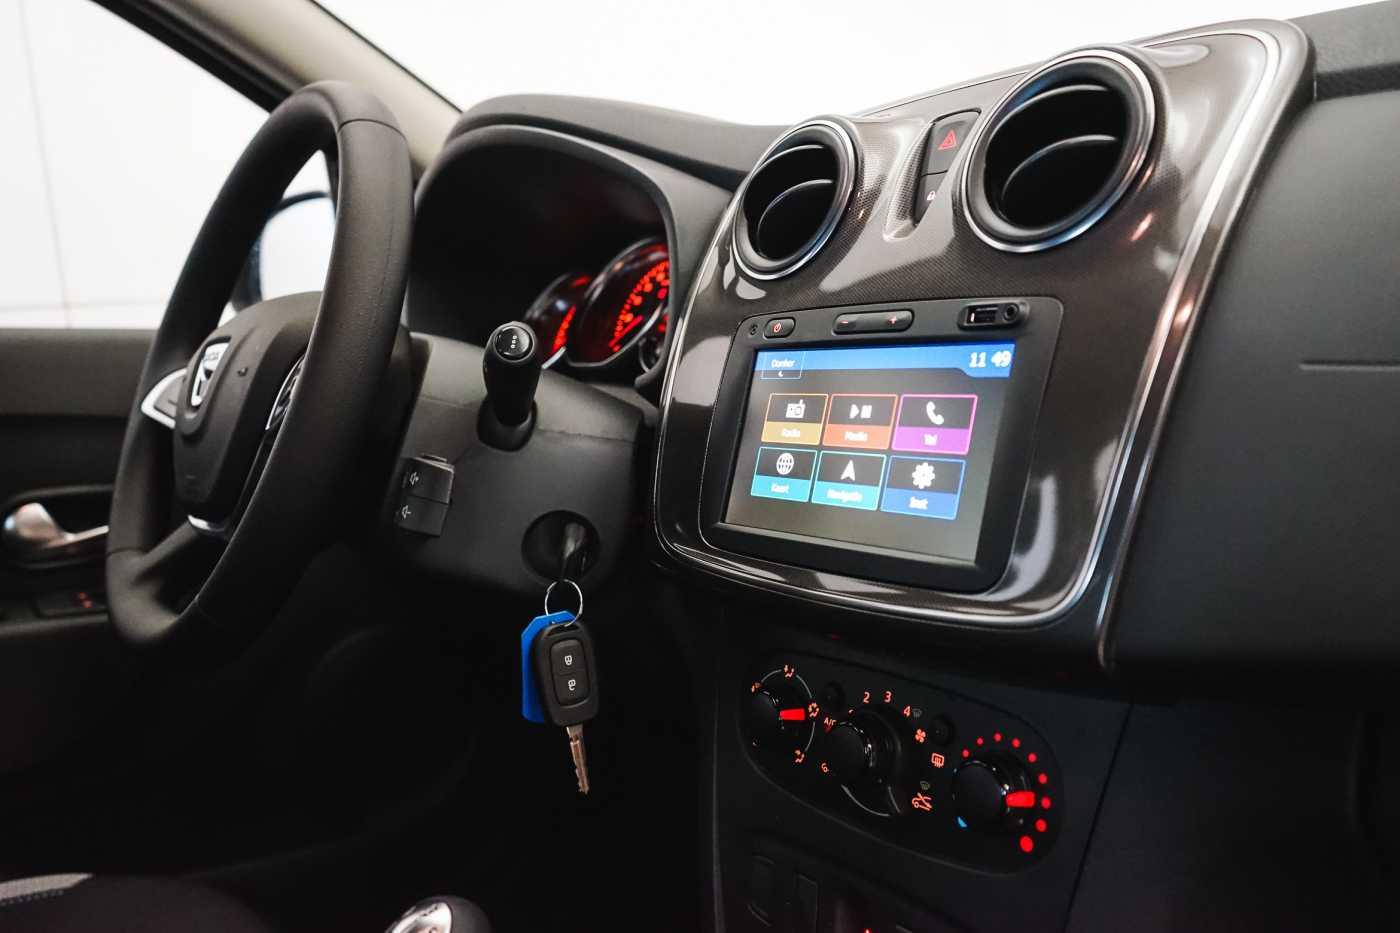 Dacia Sandero 1.0i SCe Stepway // Navi, Bluetooth, Airco, USB 12/27